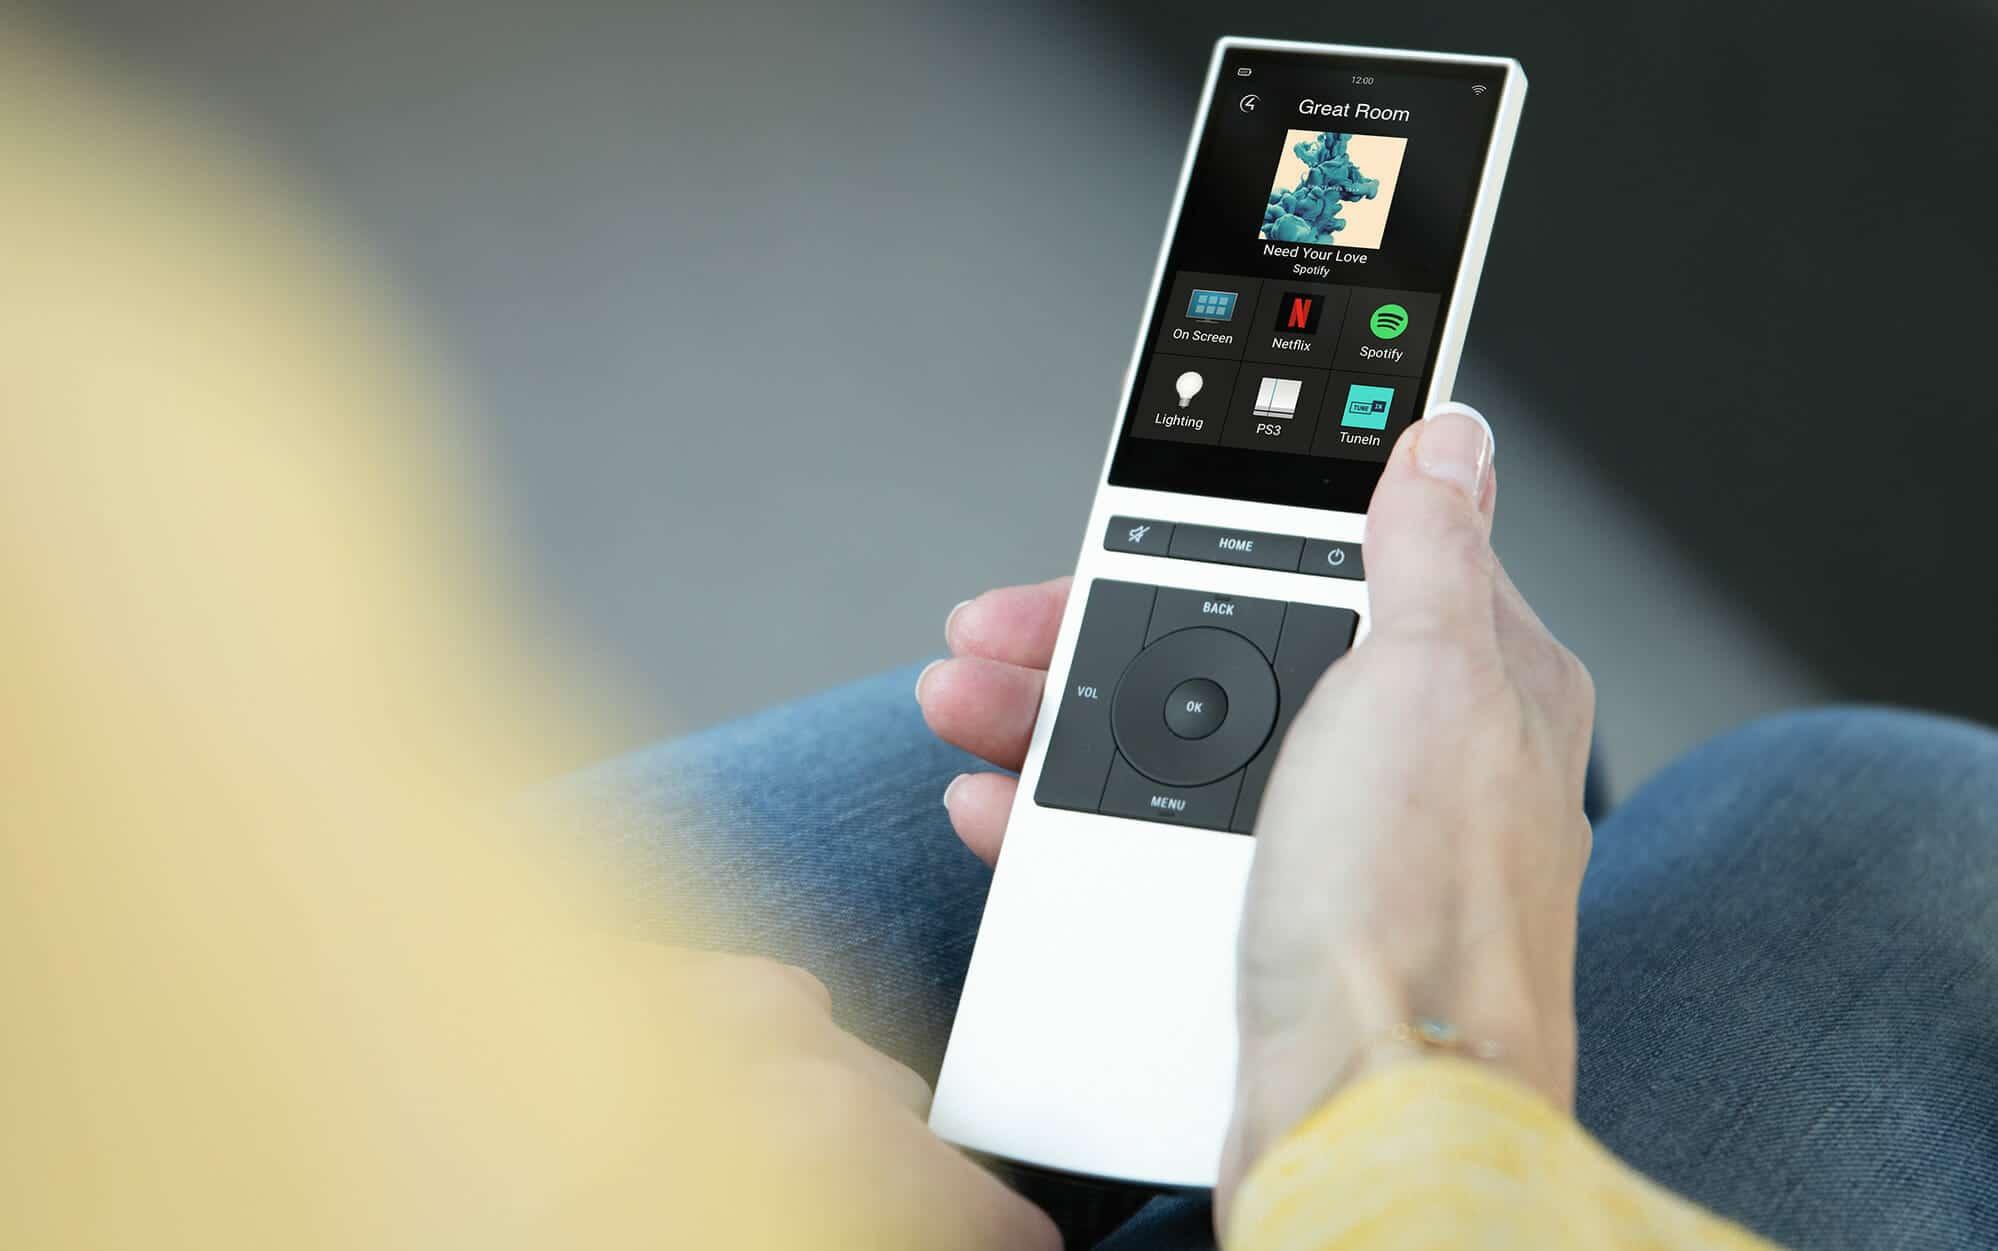 Control4 Neeo Smart Remote